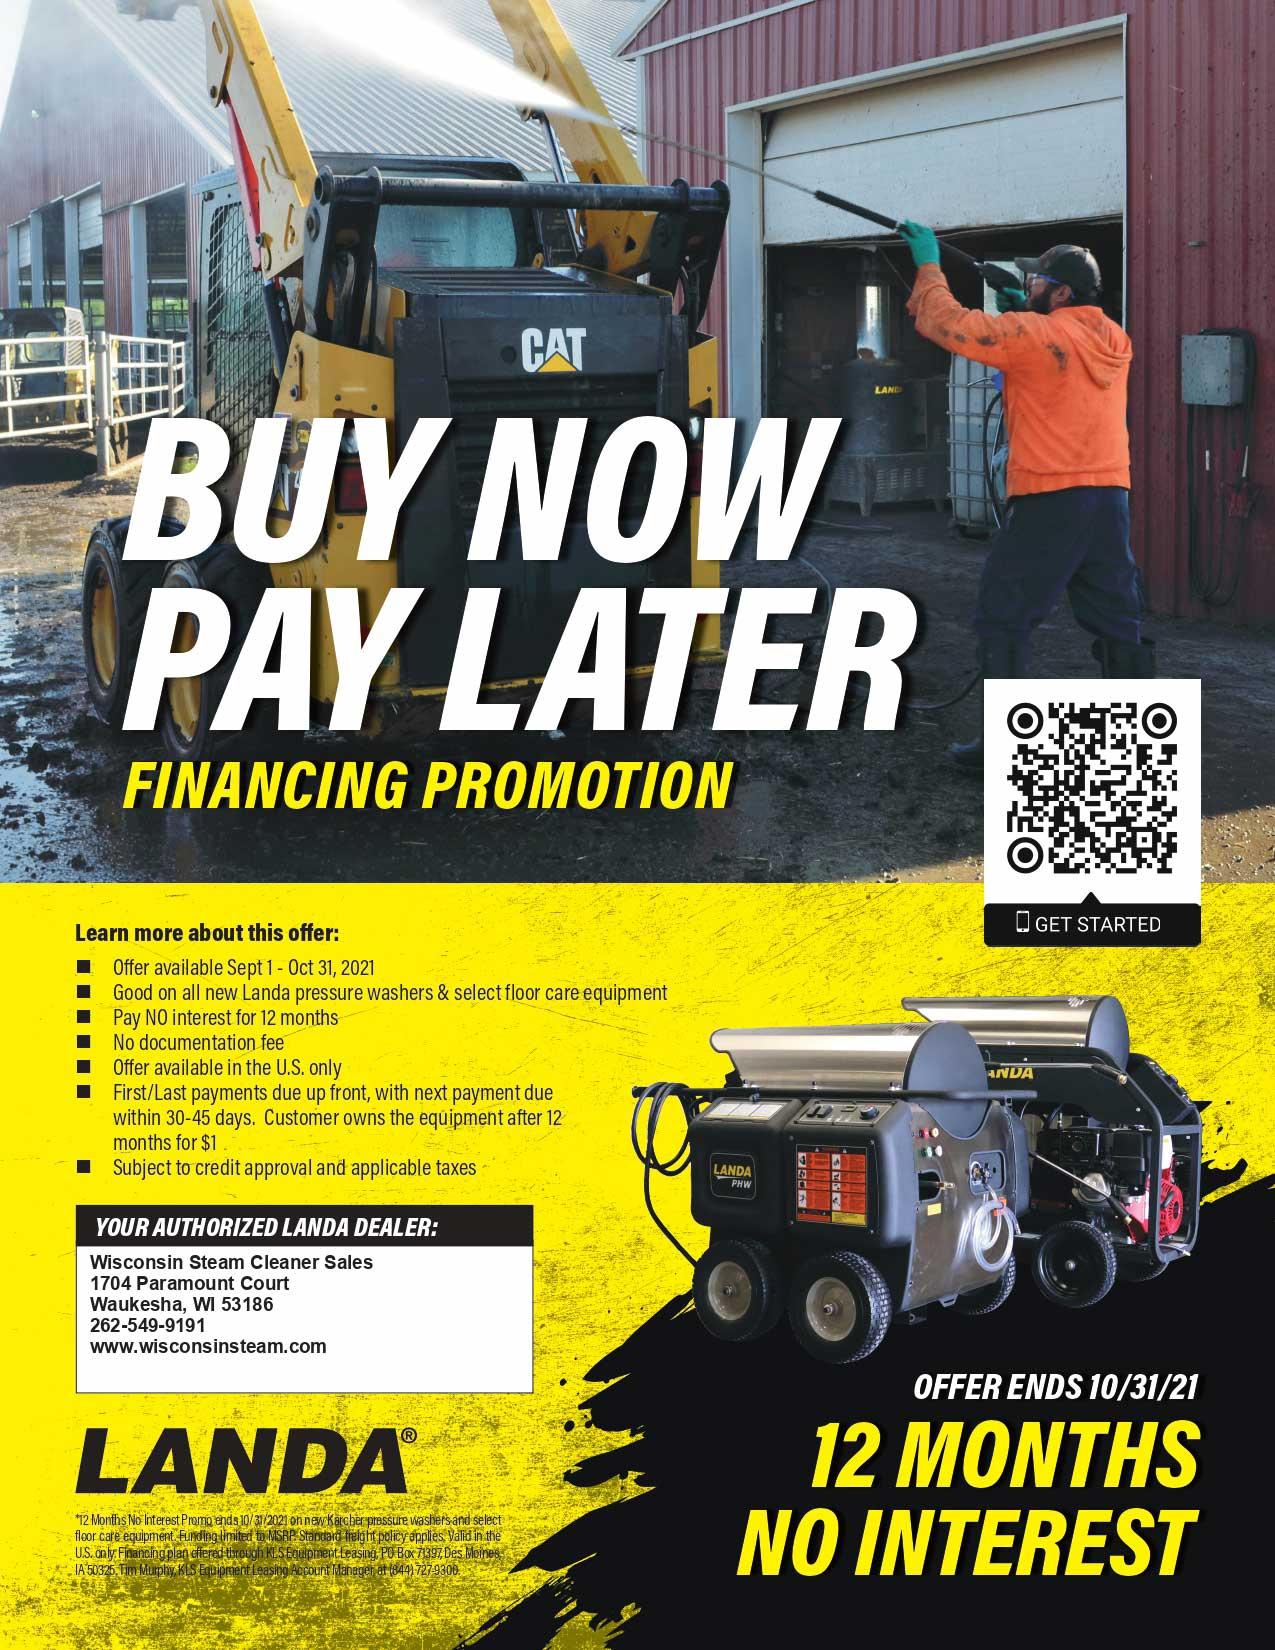 LAN_Fall-Financing-Promo_KLS_End-User-Flyer_0921 (1)_page-0001